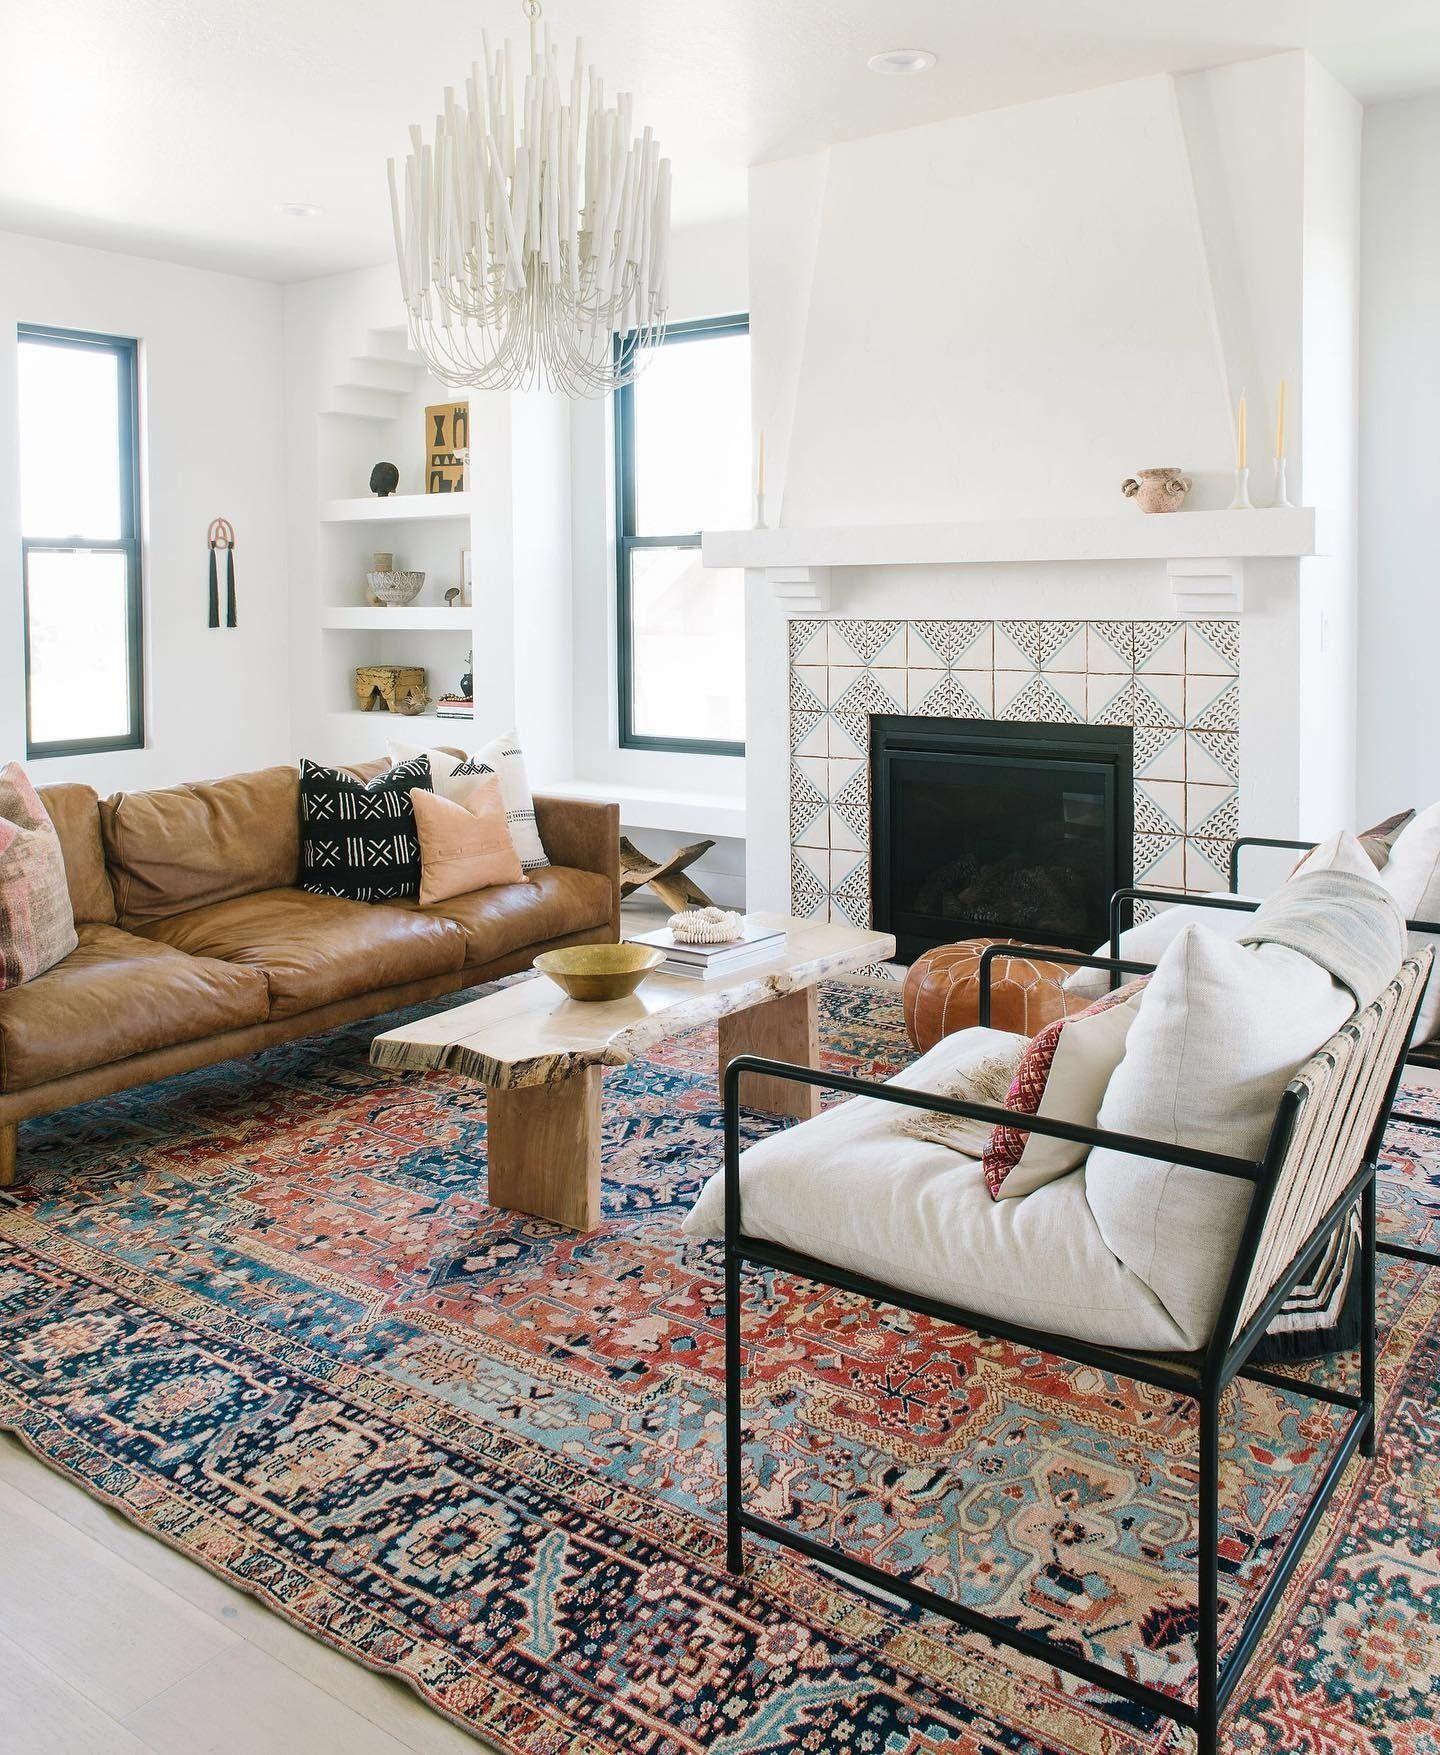 Nirvana Dakota Tan Sofa Rugs In Living Room Persian Rug Living Room Tan Sofa #red #fur #rug #for #living #room